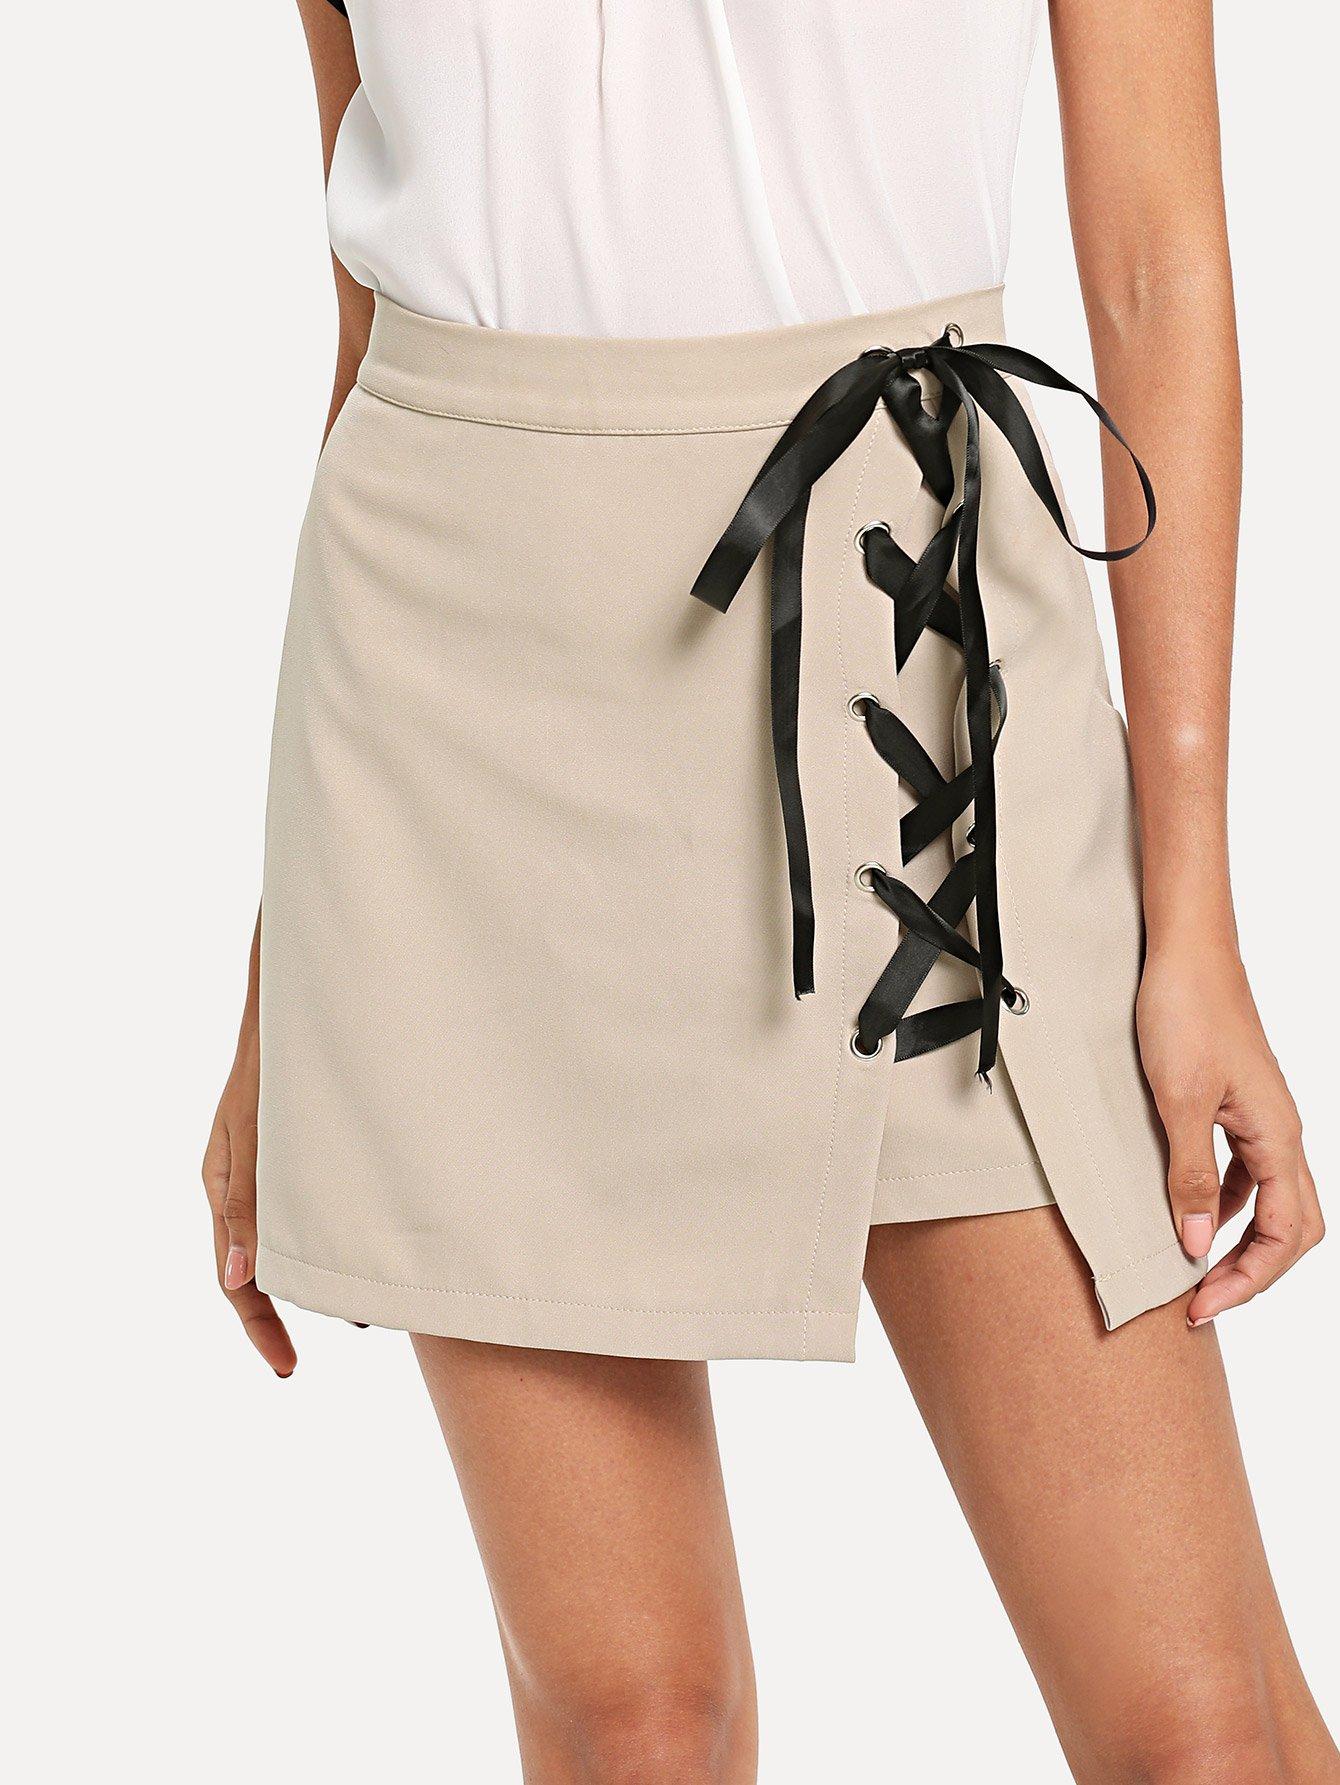 Asymmetrical Hem Lace Up Skirt orange lace up design irregular hem skirt